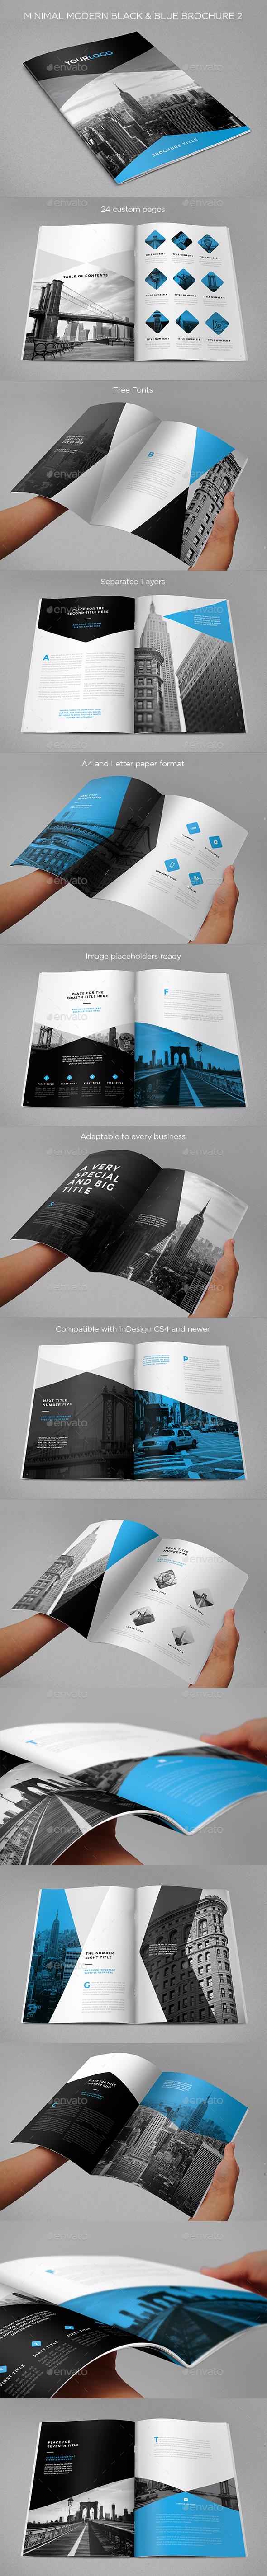 Minimal Modern Black & Blue Brochure 2 - Brochures Print Templates